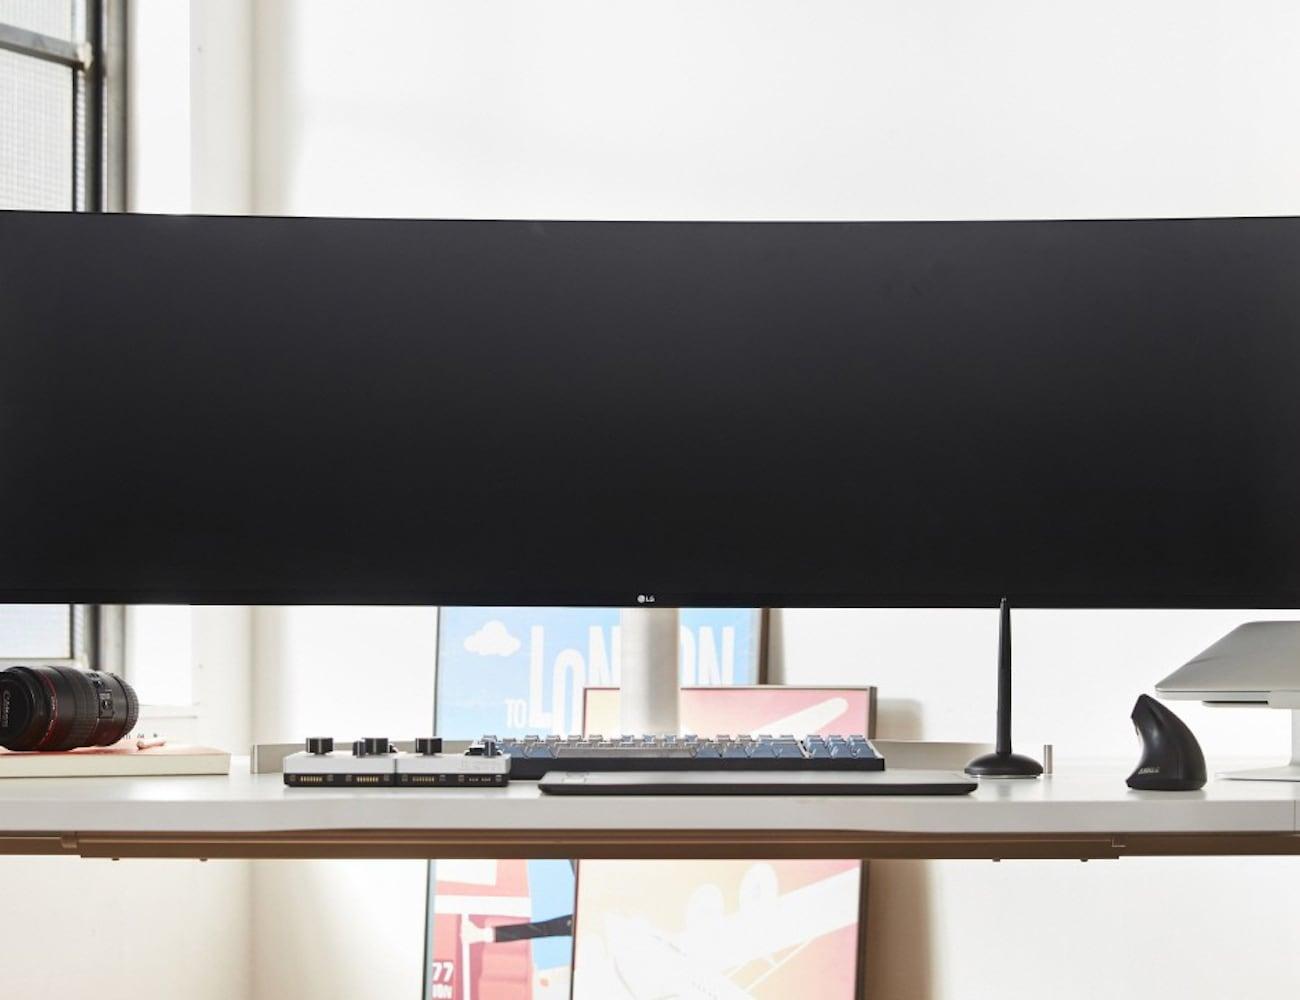 LG UltraWide 49-Inch Monitor